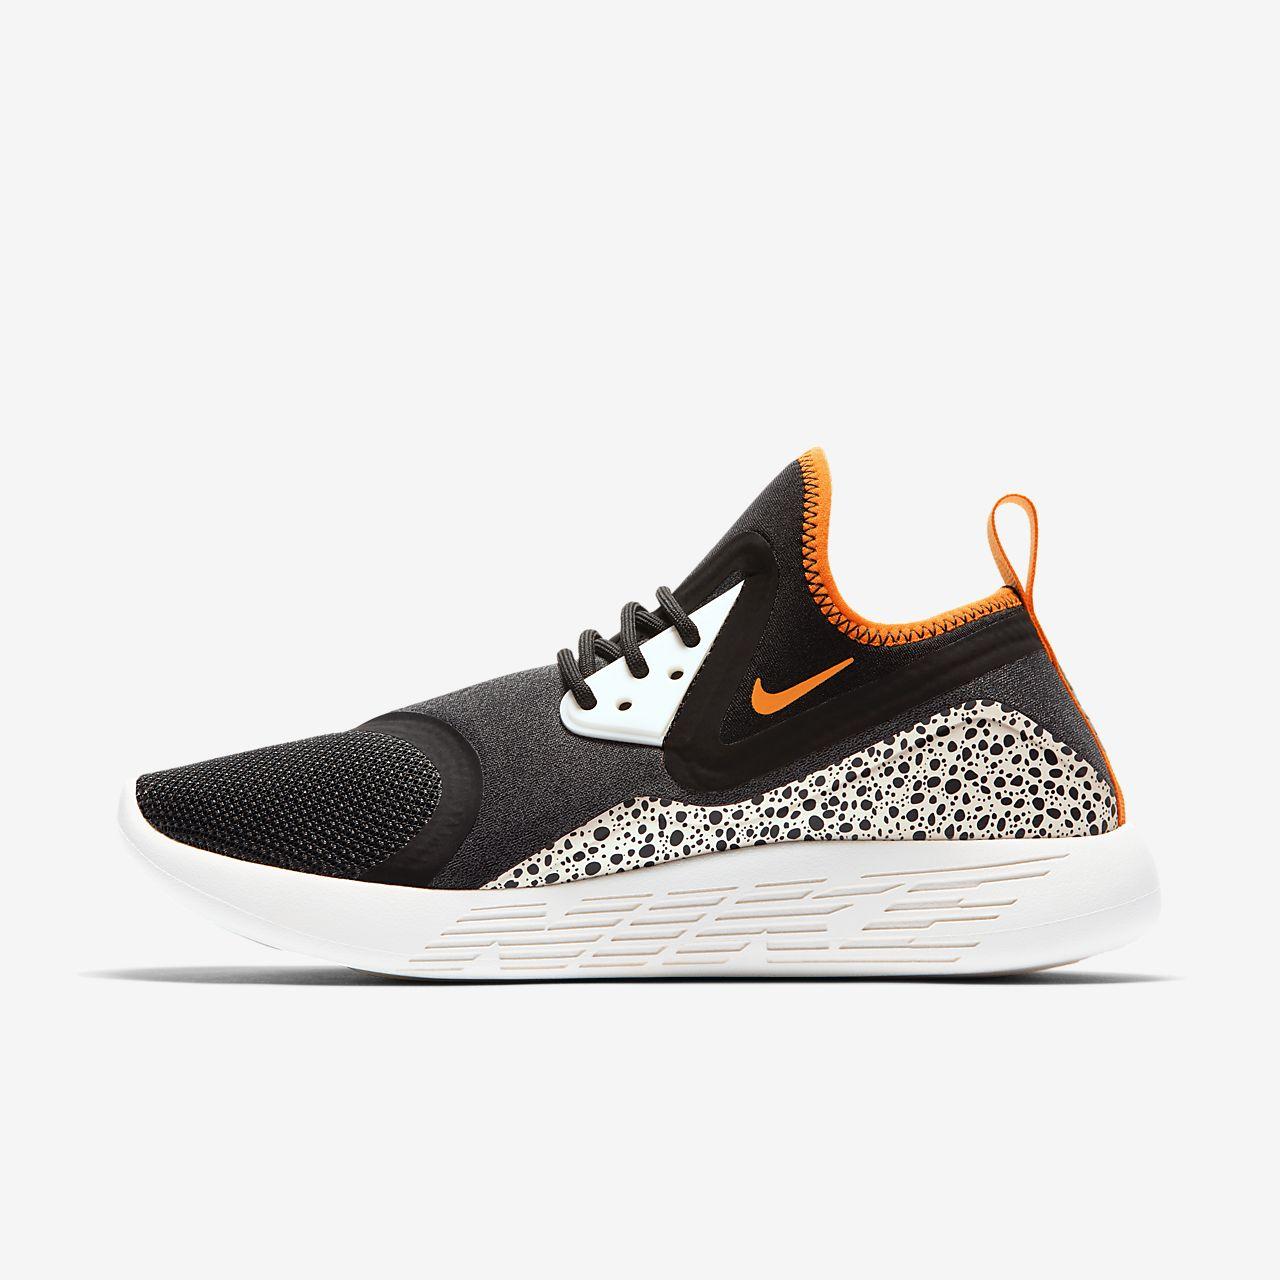 ... Scarpa Nike LunarCharge Essential BN - Donna